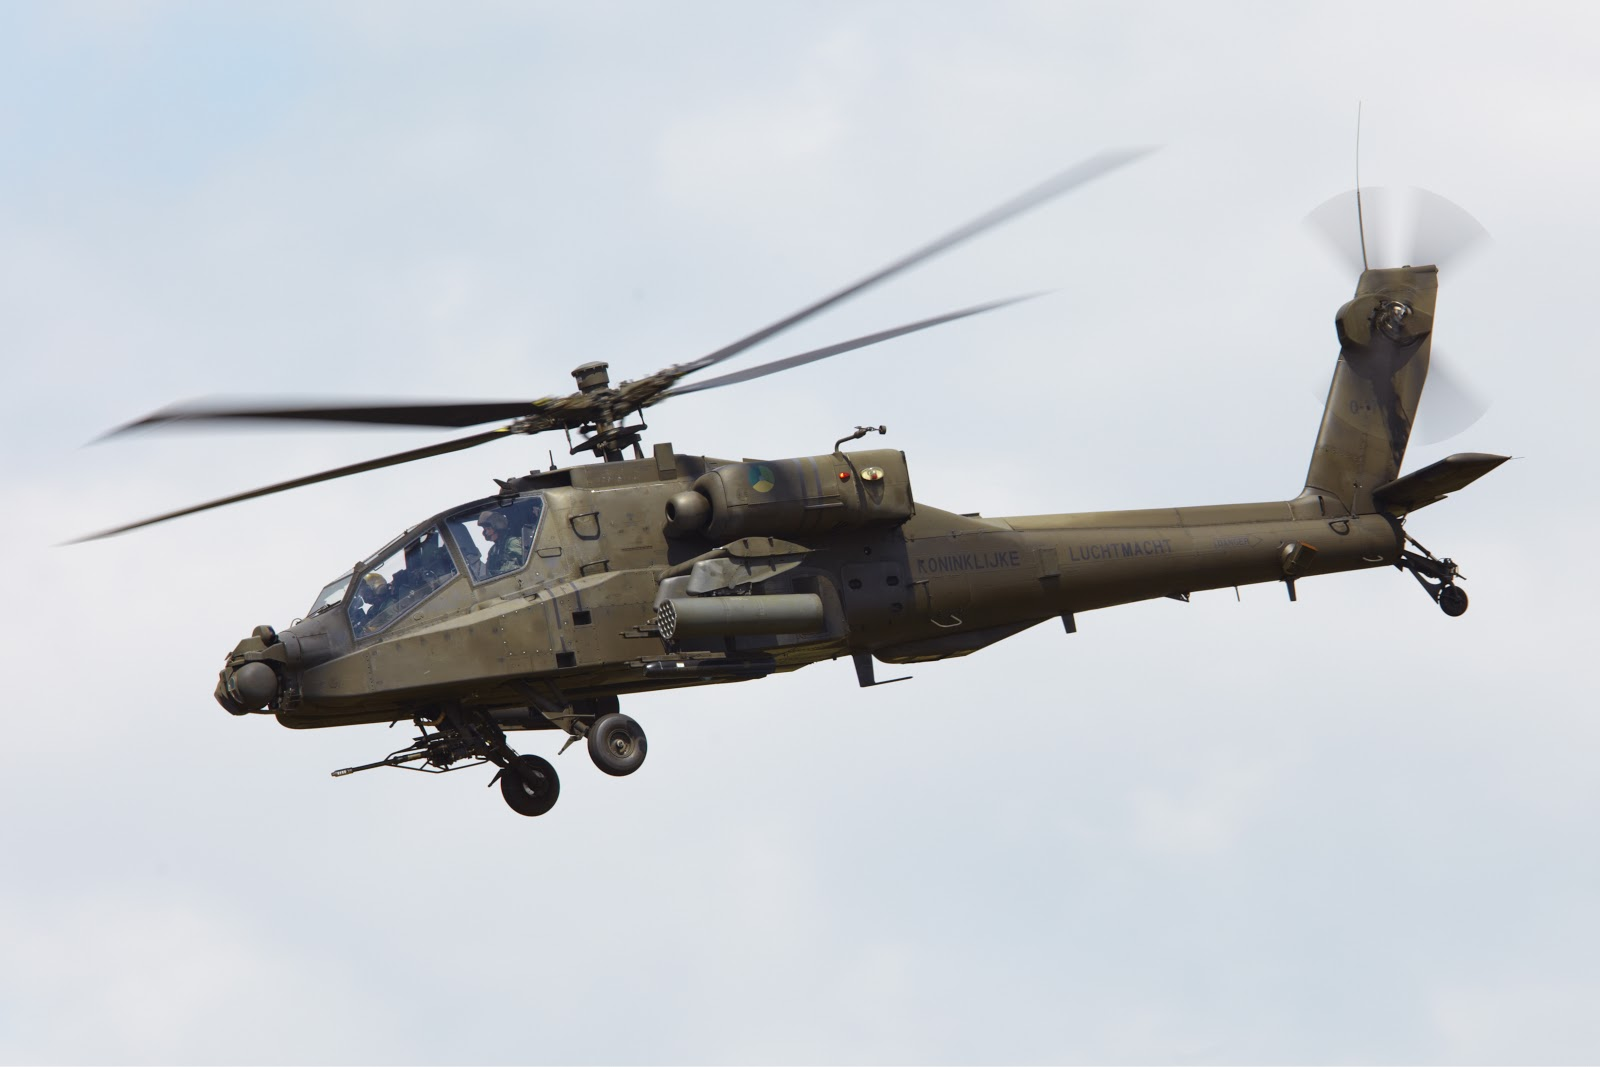 http://2.bp.blogspot.com/-m9GR4sL_TaQ/T5gEazbQbeI/AAAAAAAAAxg/jqXr7I6mN9I/s1600/apache%20helicopters%20ah-64.jpg